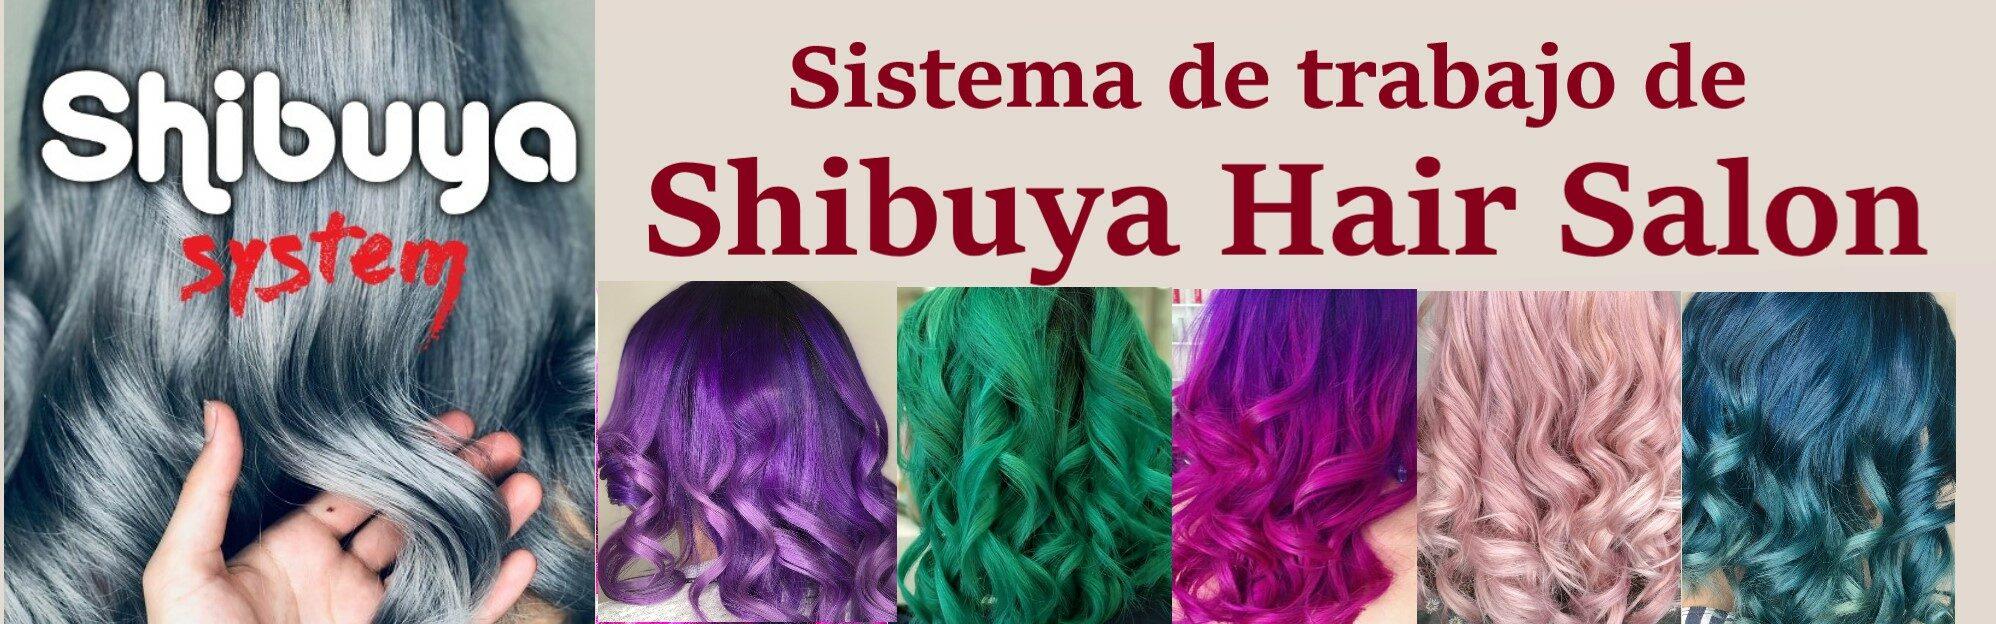 Sistema de trabajo de Shibuya Hair Salon